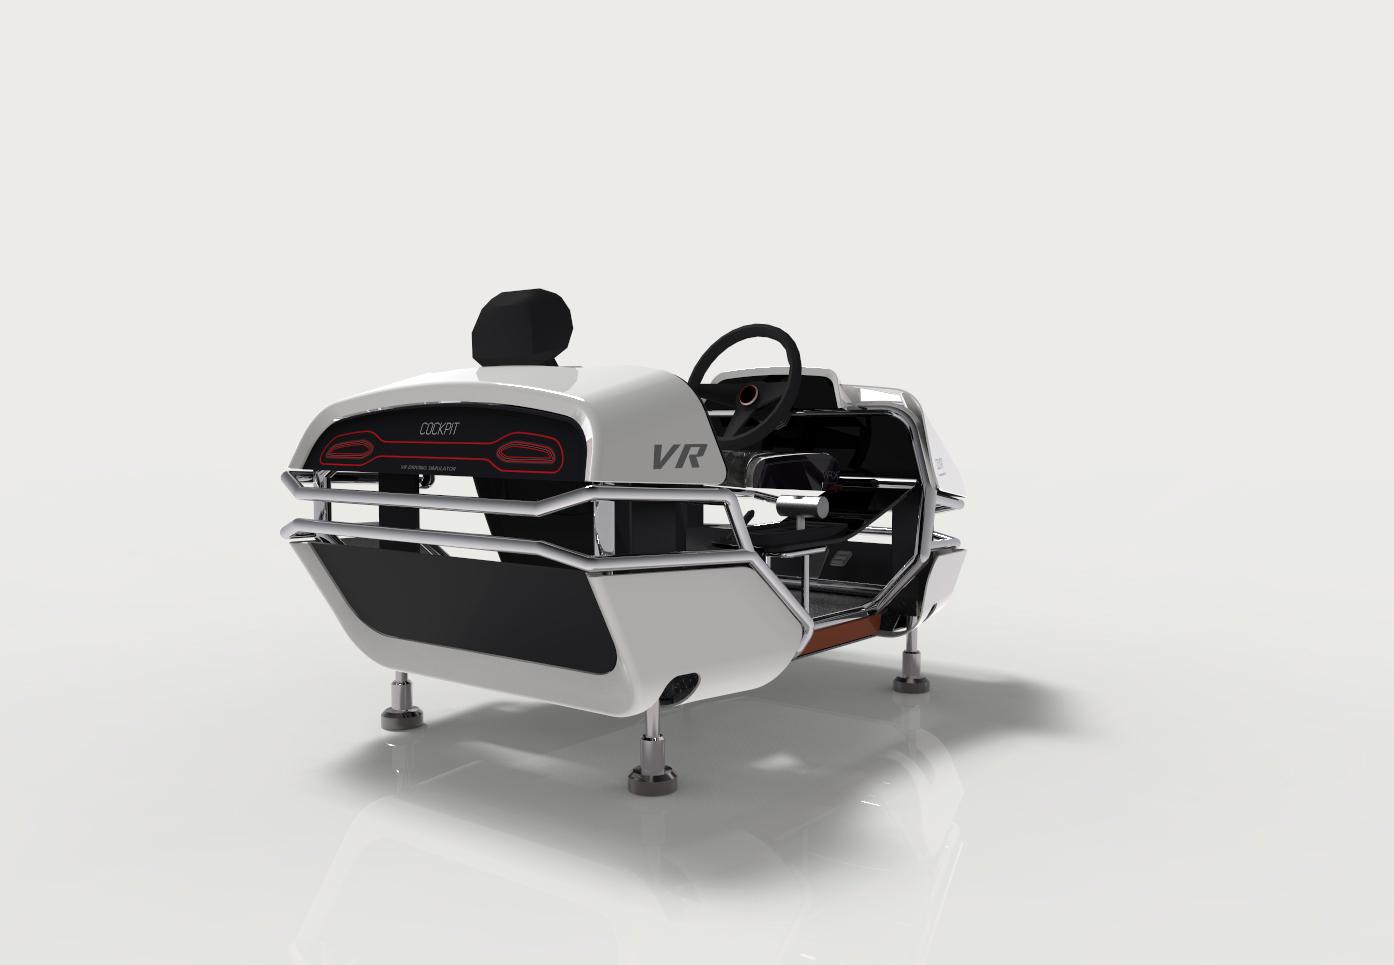 VR 드라이빙 시뮬레이터 제품디자인